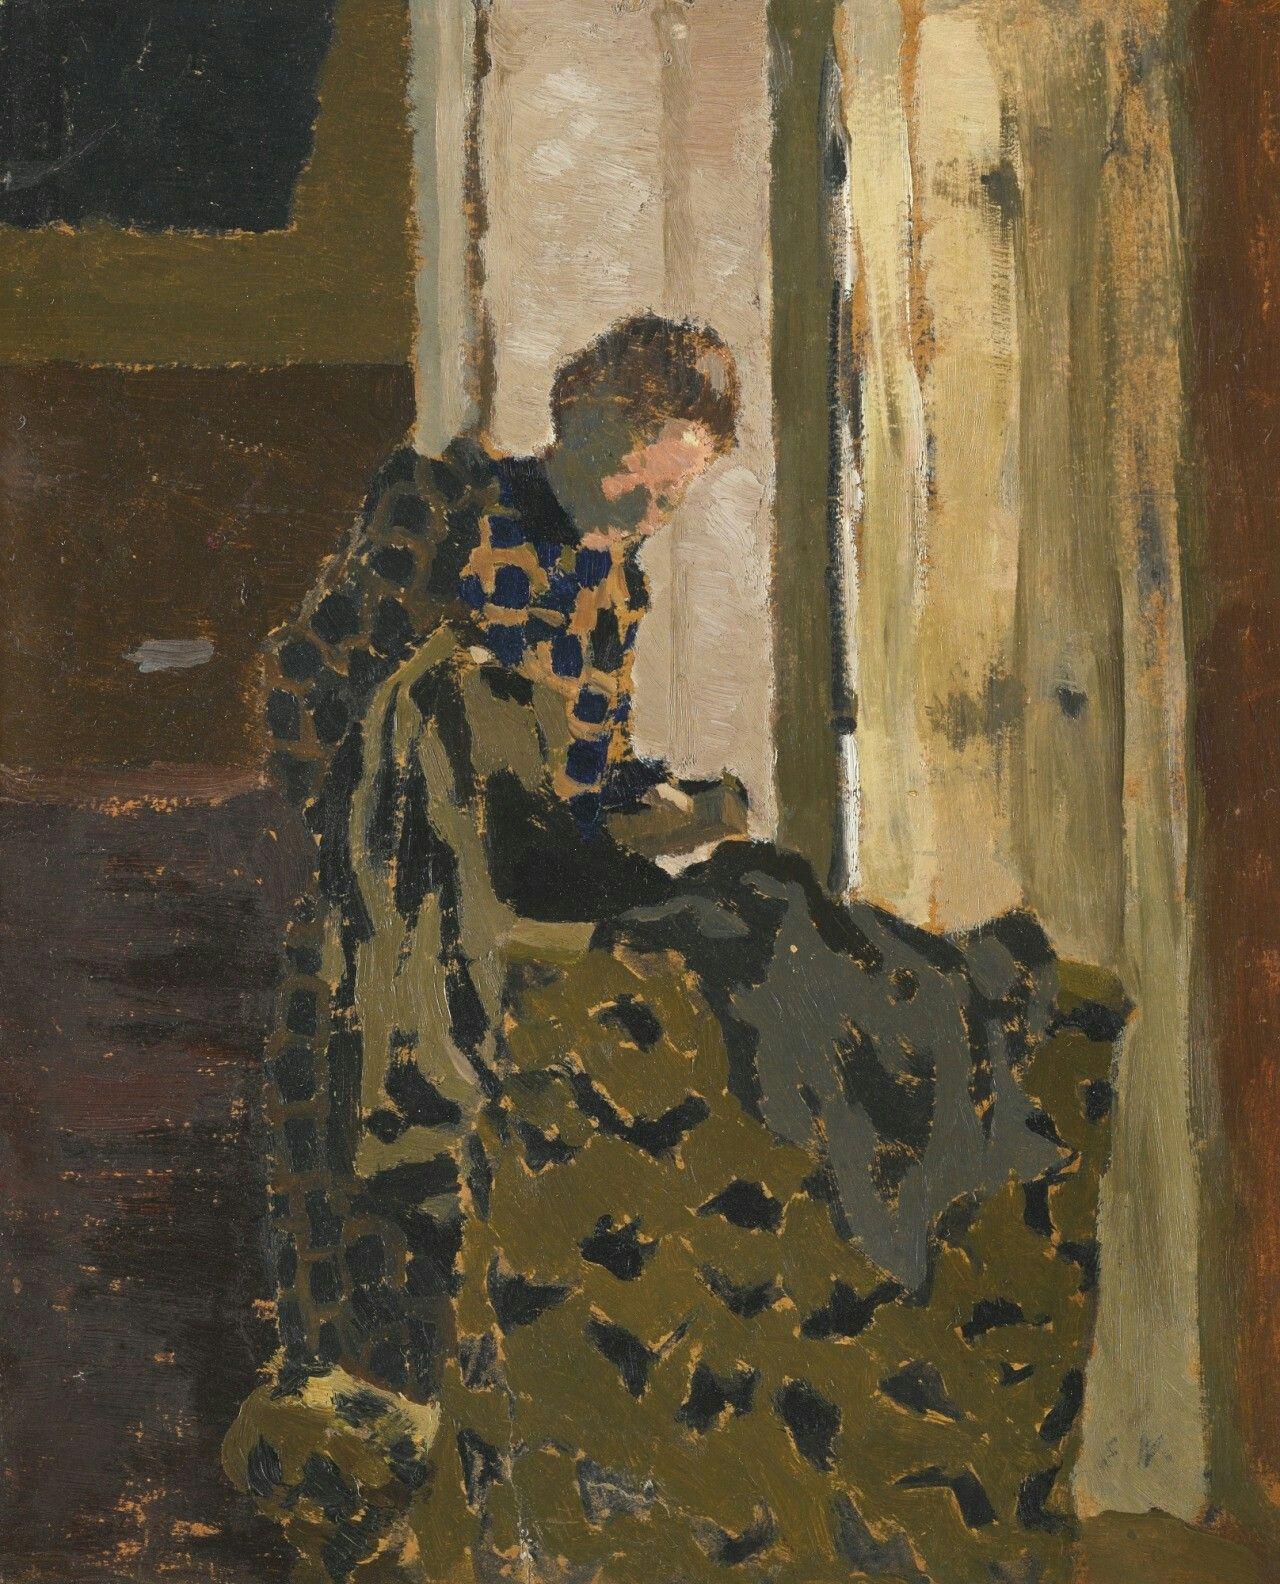 Édouard Vuillard (French, 1868-1940),Marie brossant un vêtement à la fenêtre[Marie brushing a garment at the window], c.1893. Oil on board, 26.7 x 22 cm.